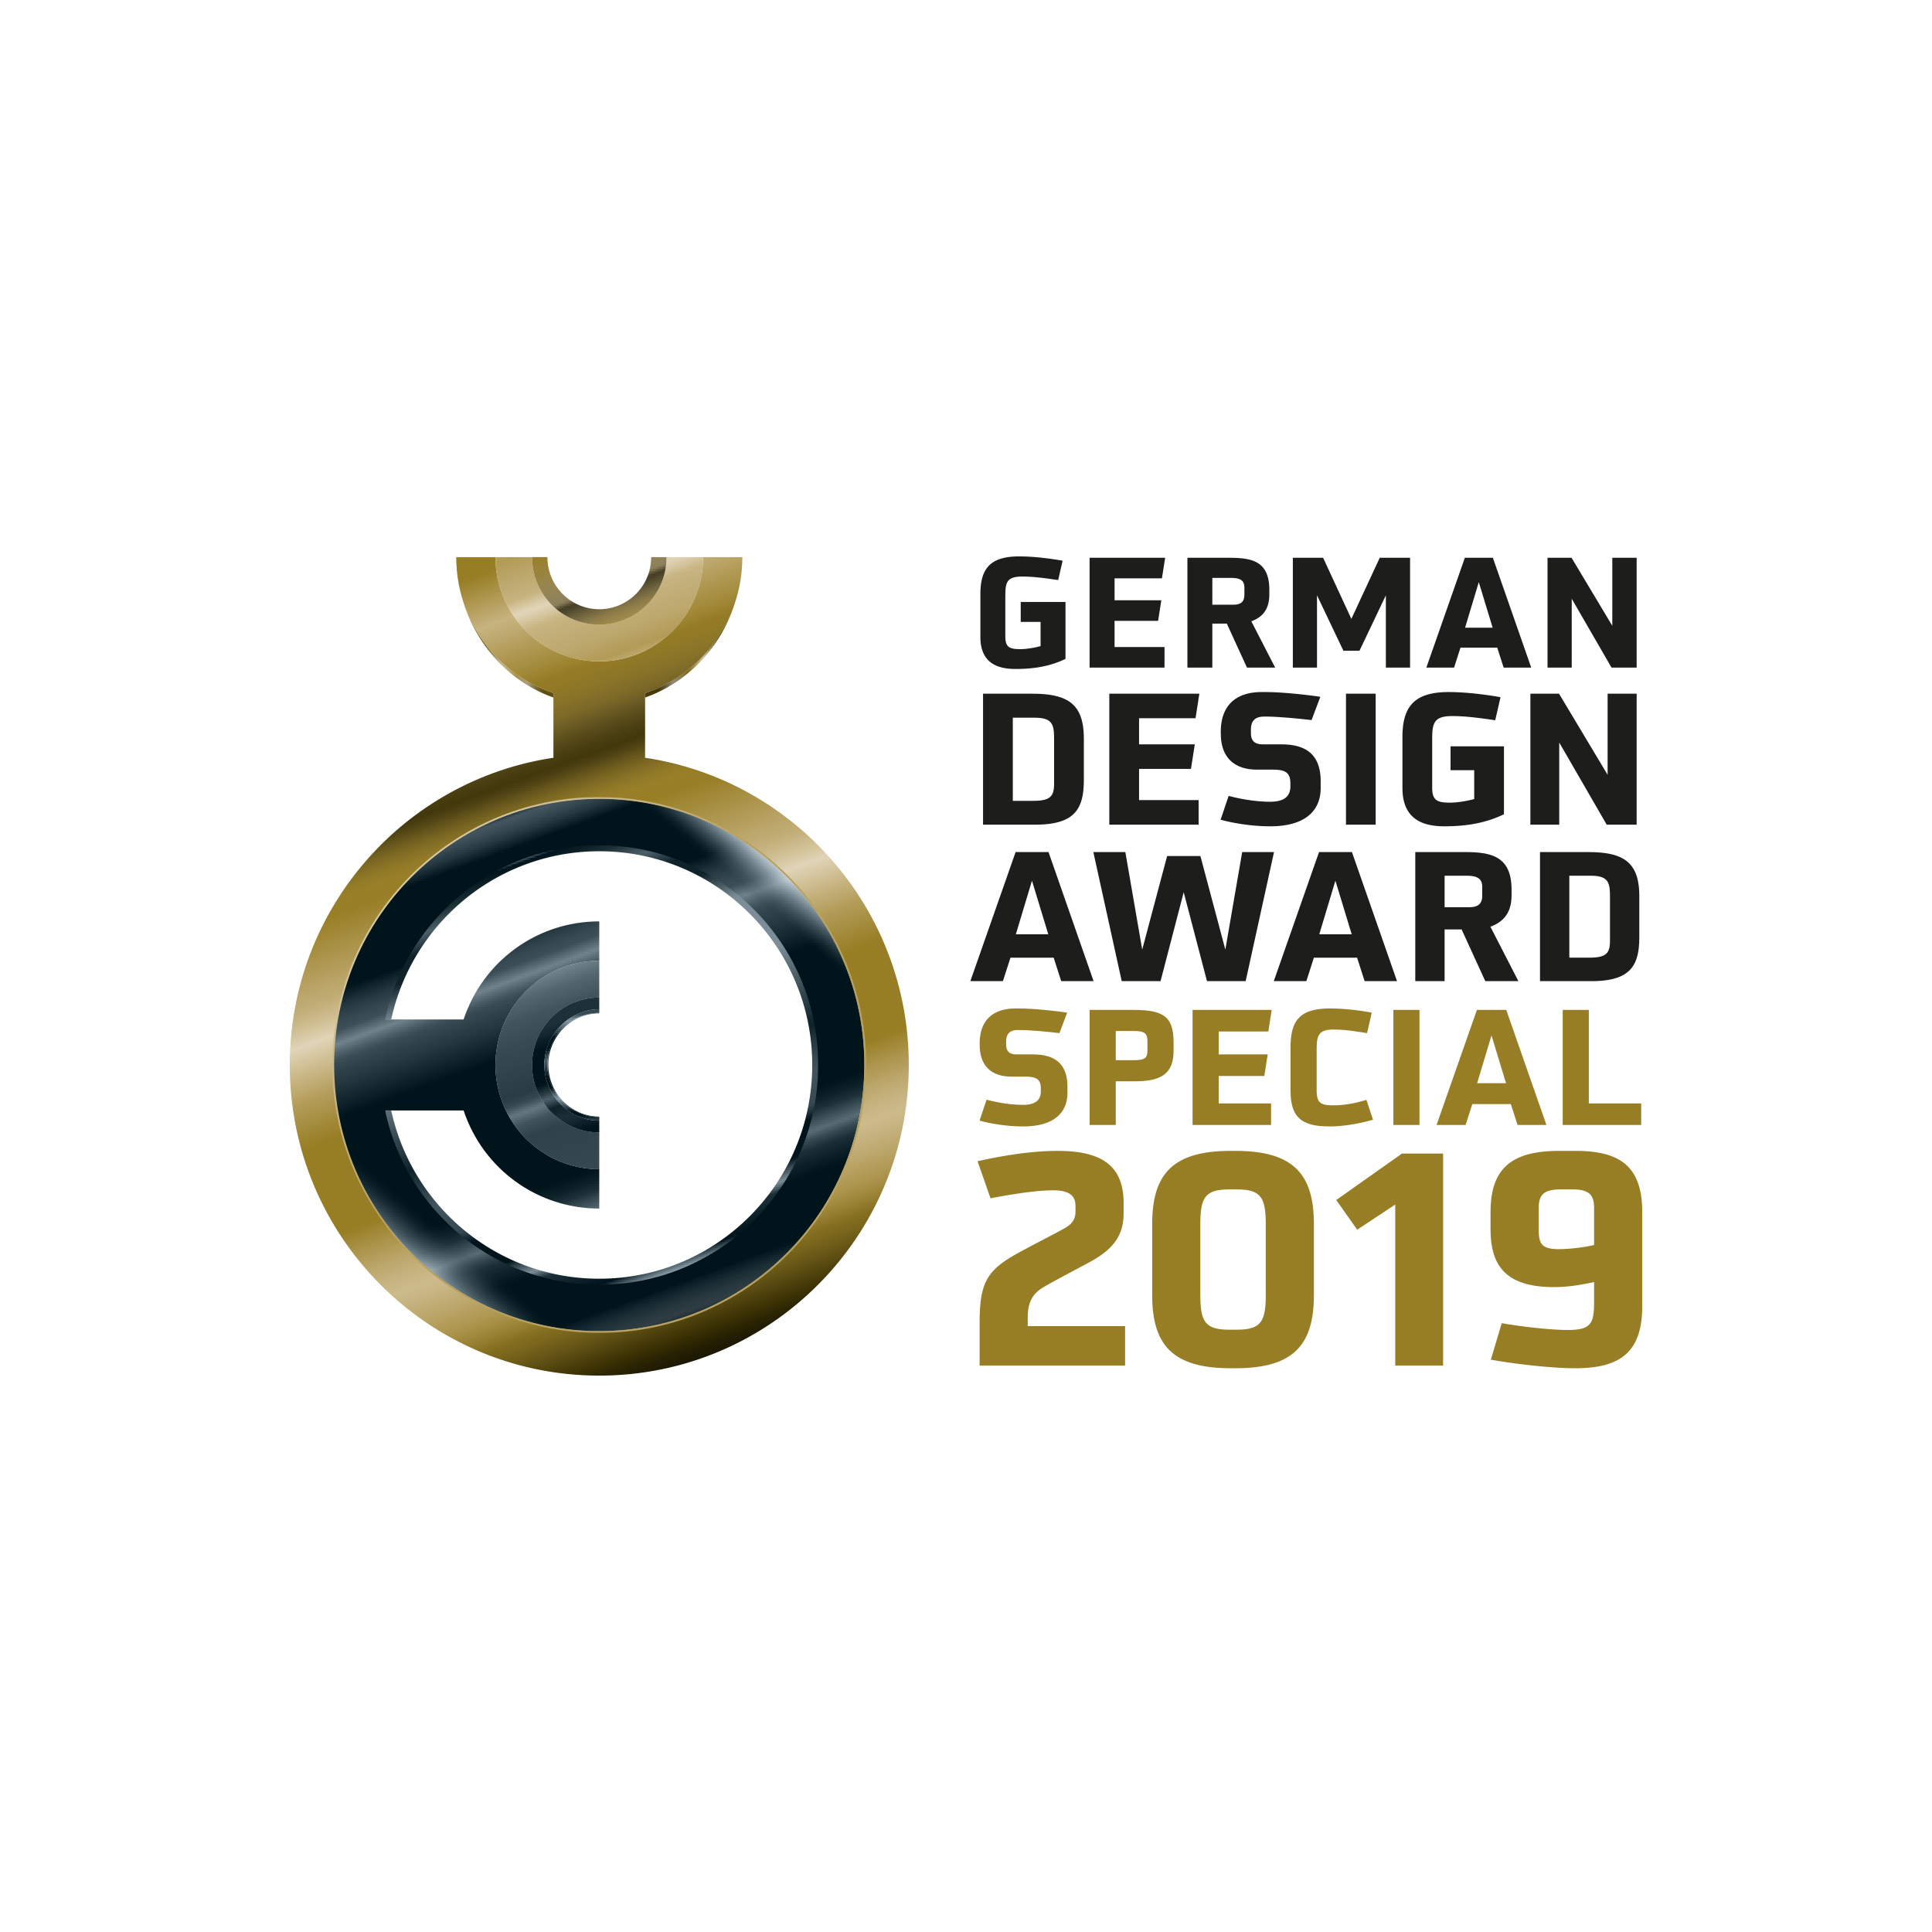 Special - GDA19 - German Design Award 2019 - Kauppi & Kauppi